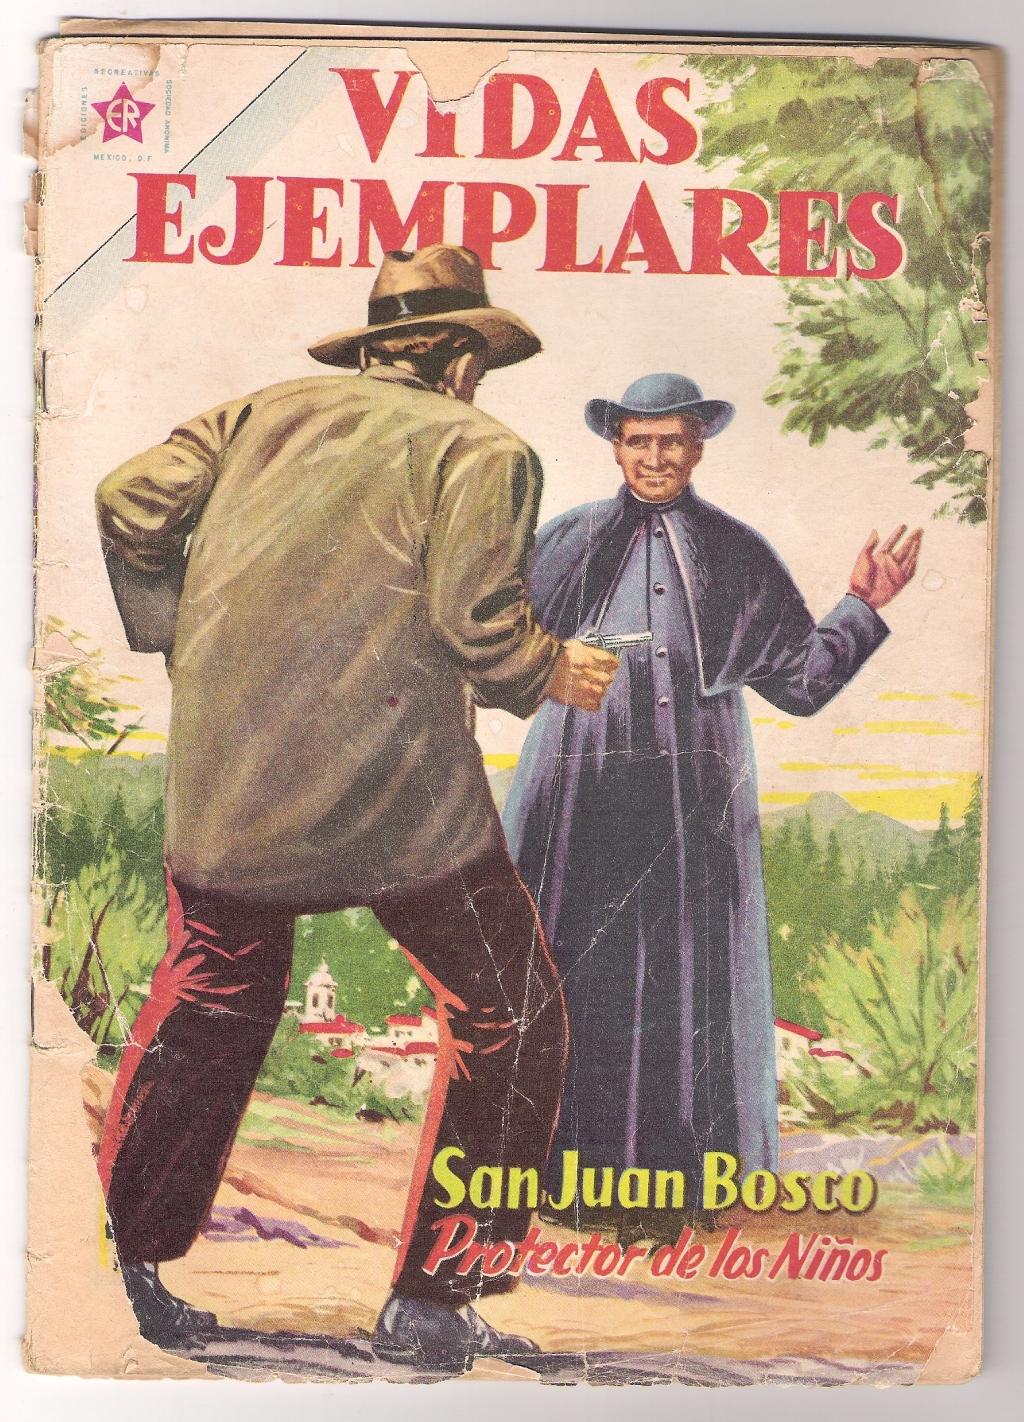 SAN JUAN BOSCO - REVISTA ER - 15 DE ENERO DE 1962